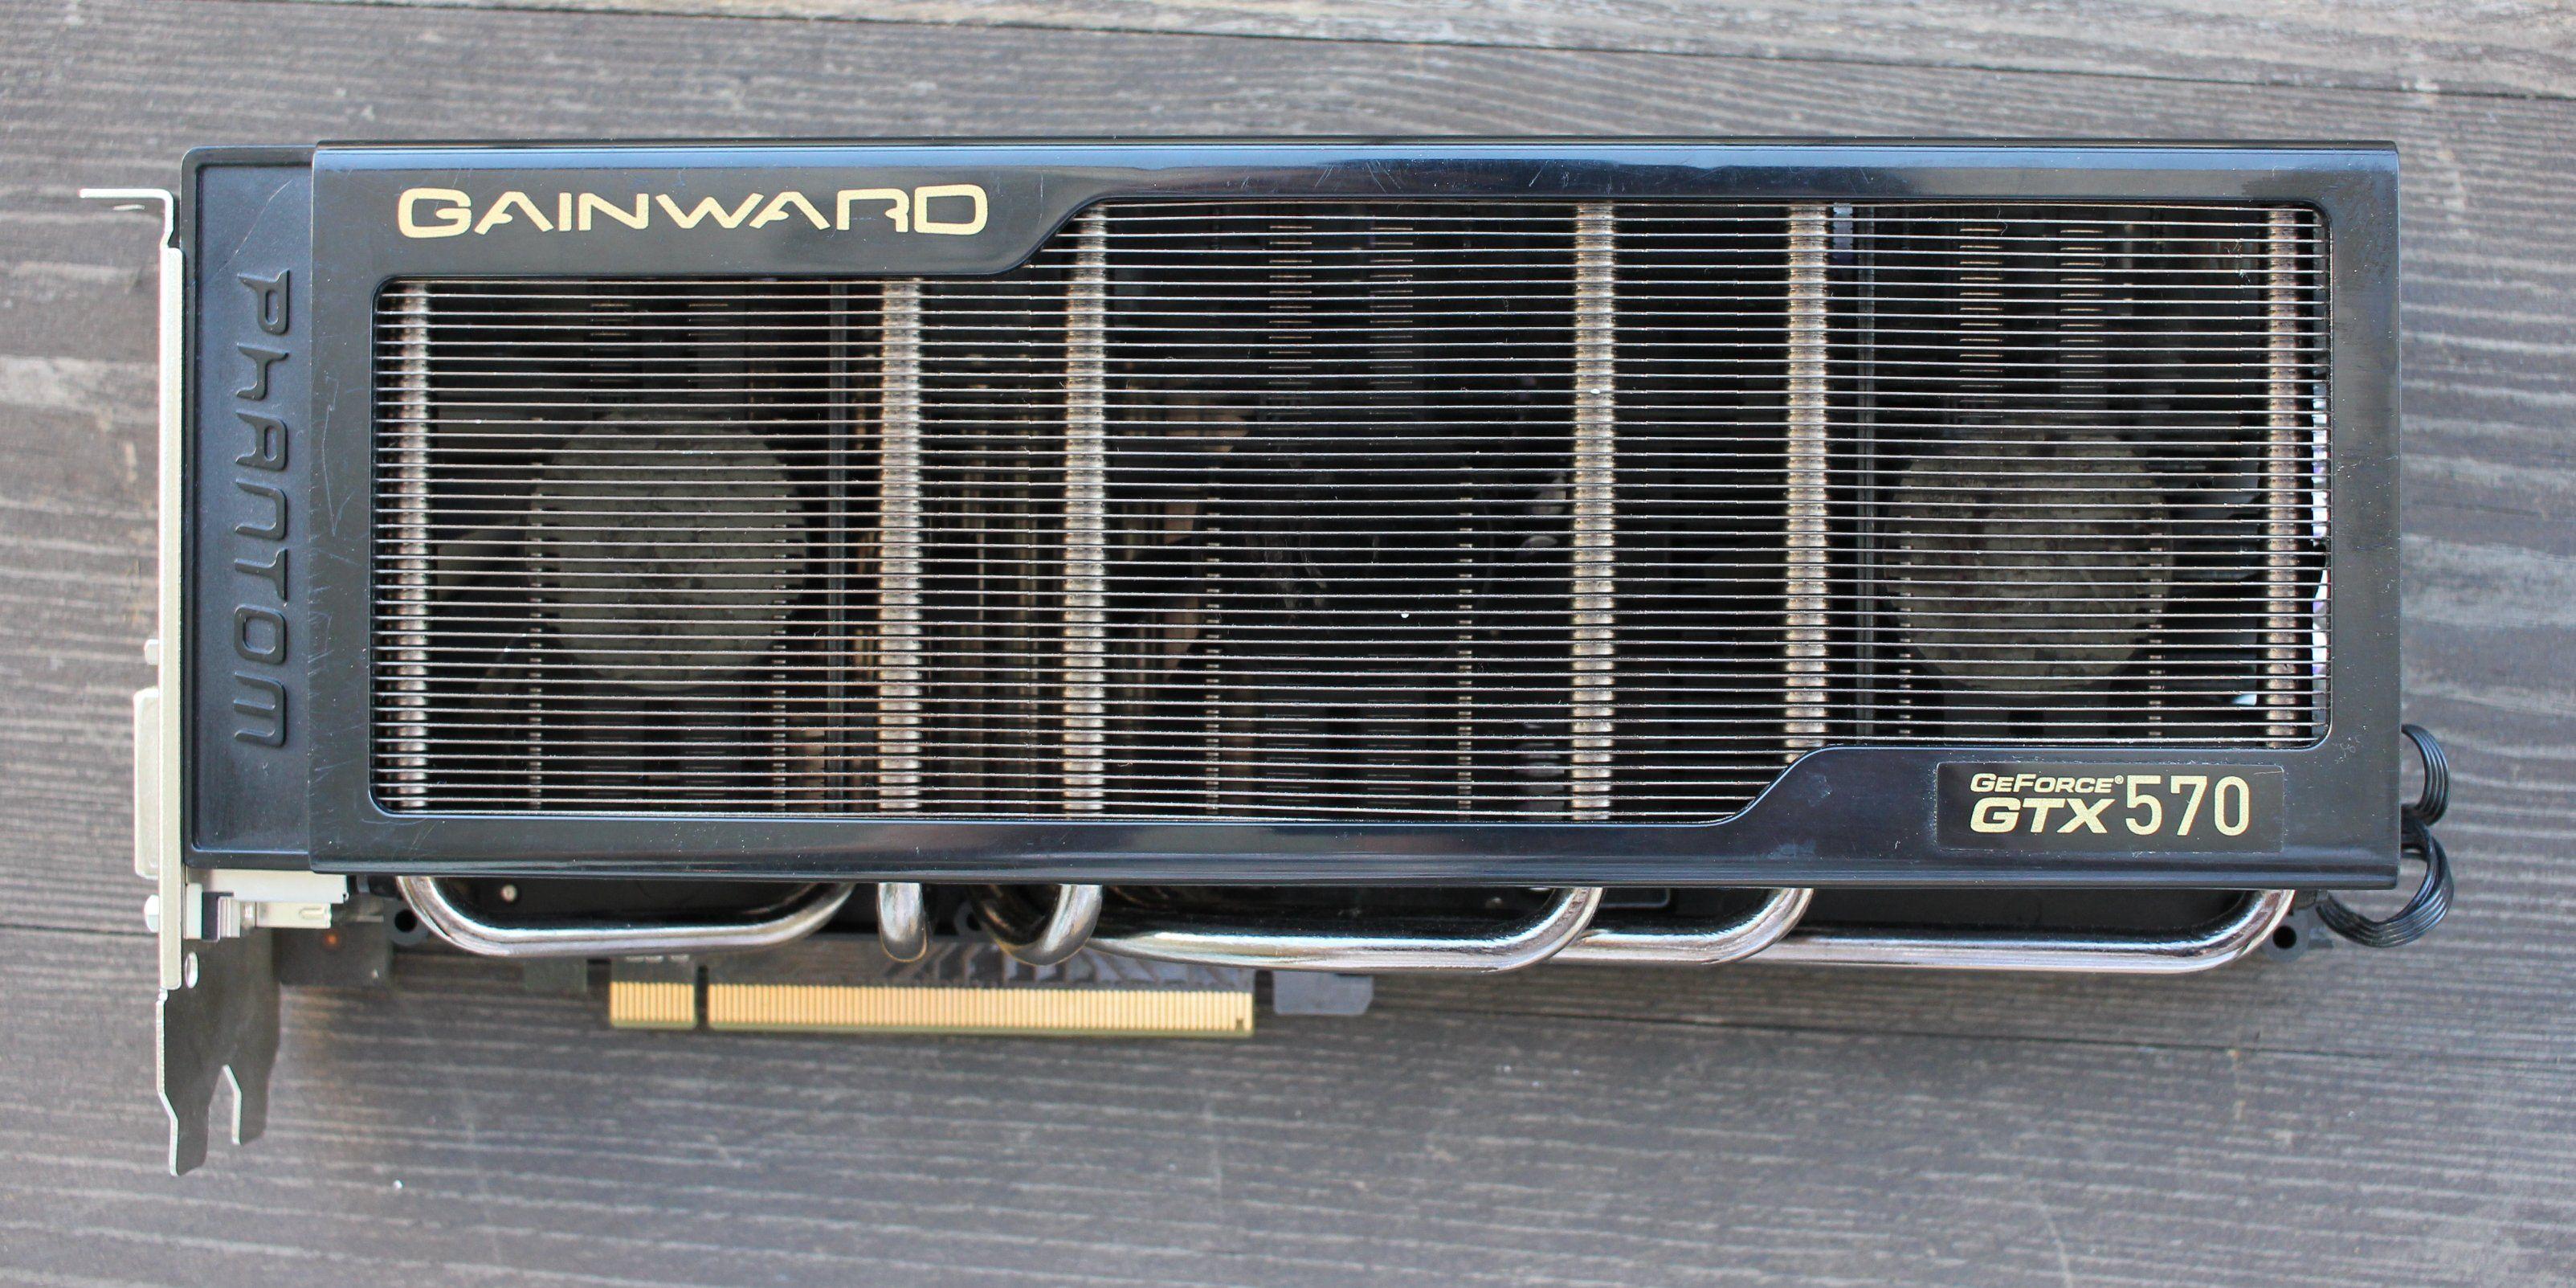 RkBlog :: Testing fancard effectiveness on GPU cooling